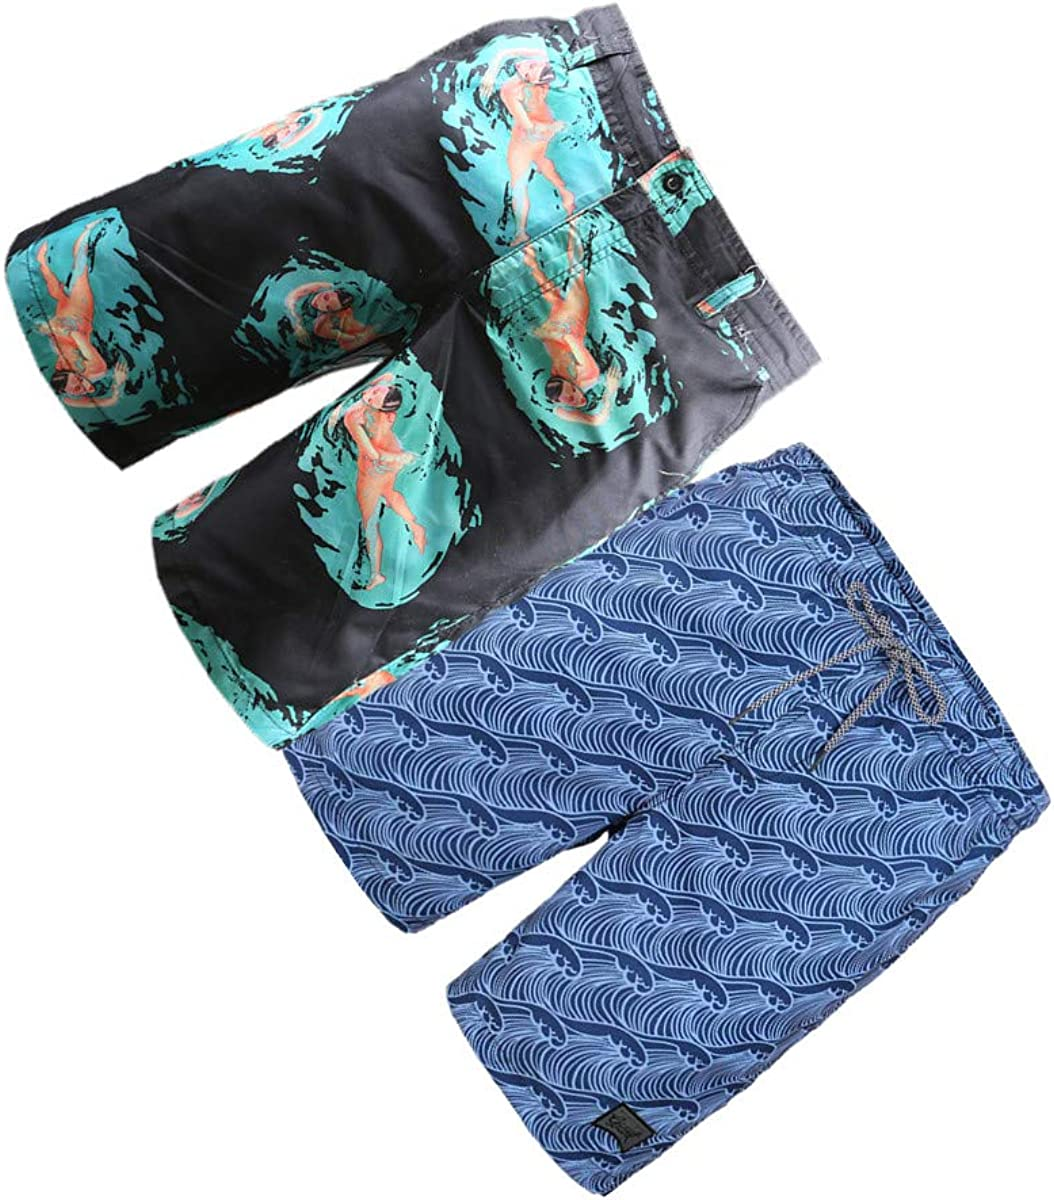 BG 2-Pcs Pack Men's Design Rash Guard Funny Graphic Casual Stripe Texture Swim Trunks